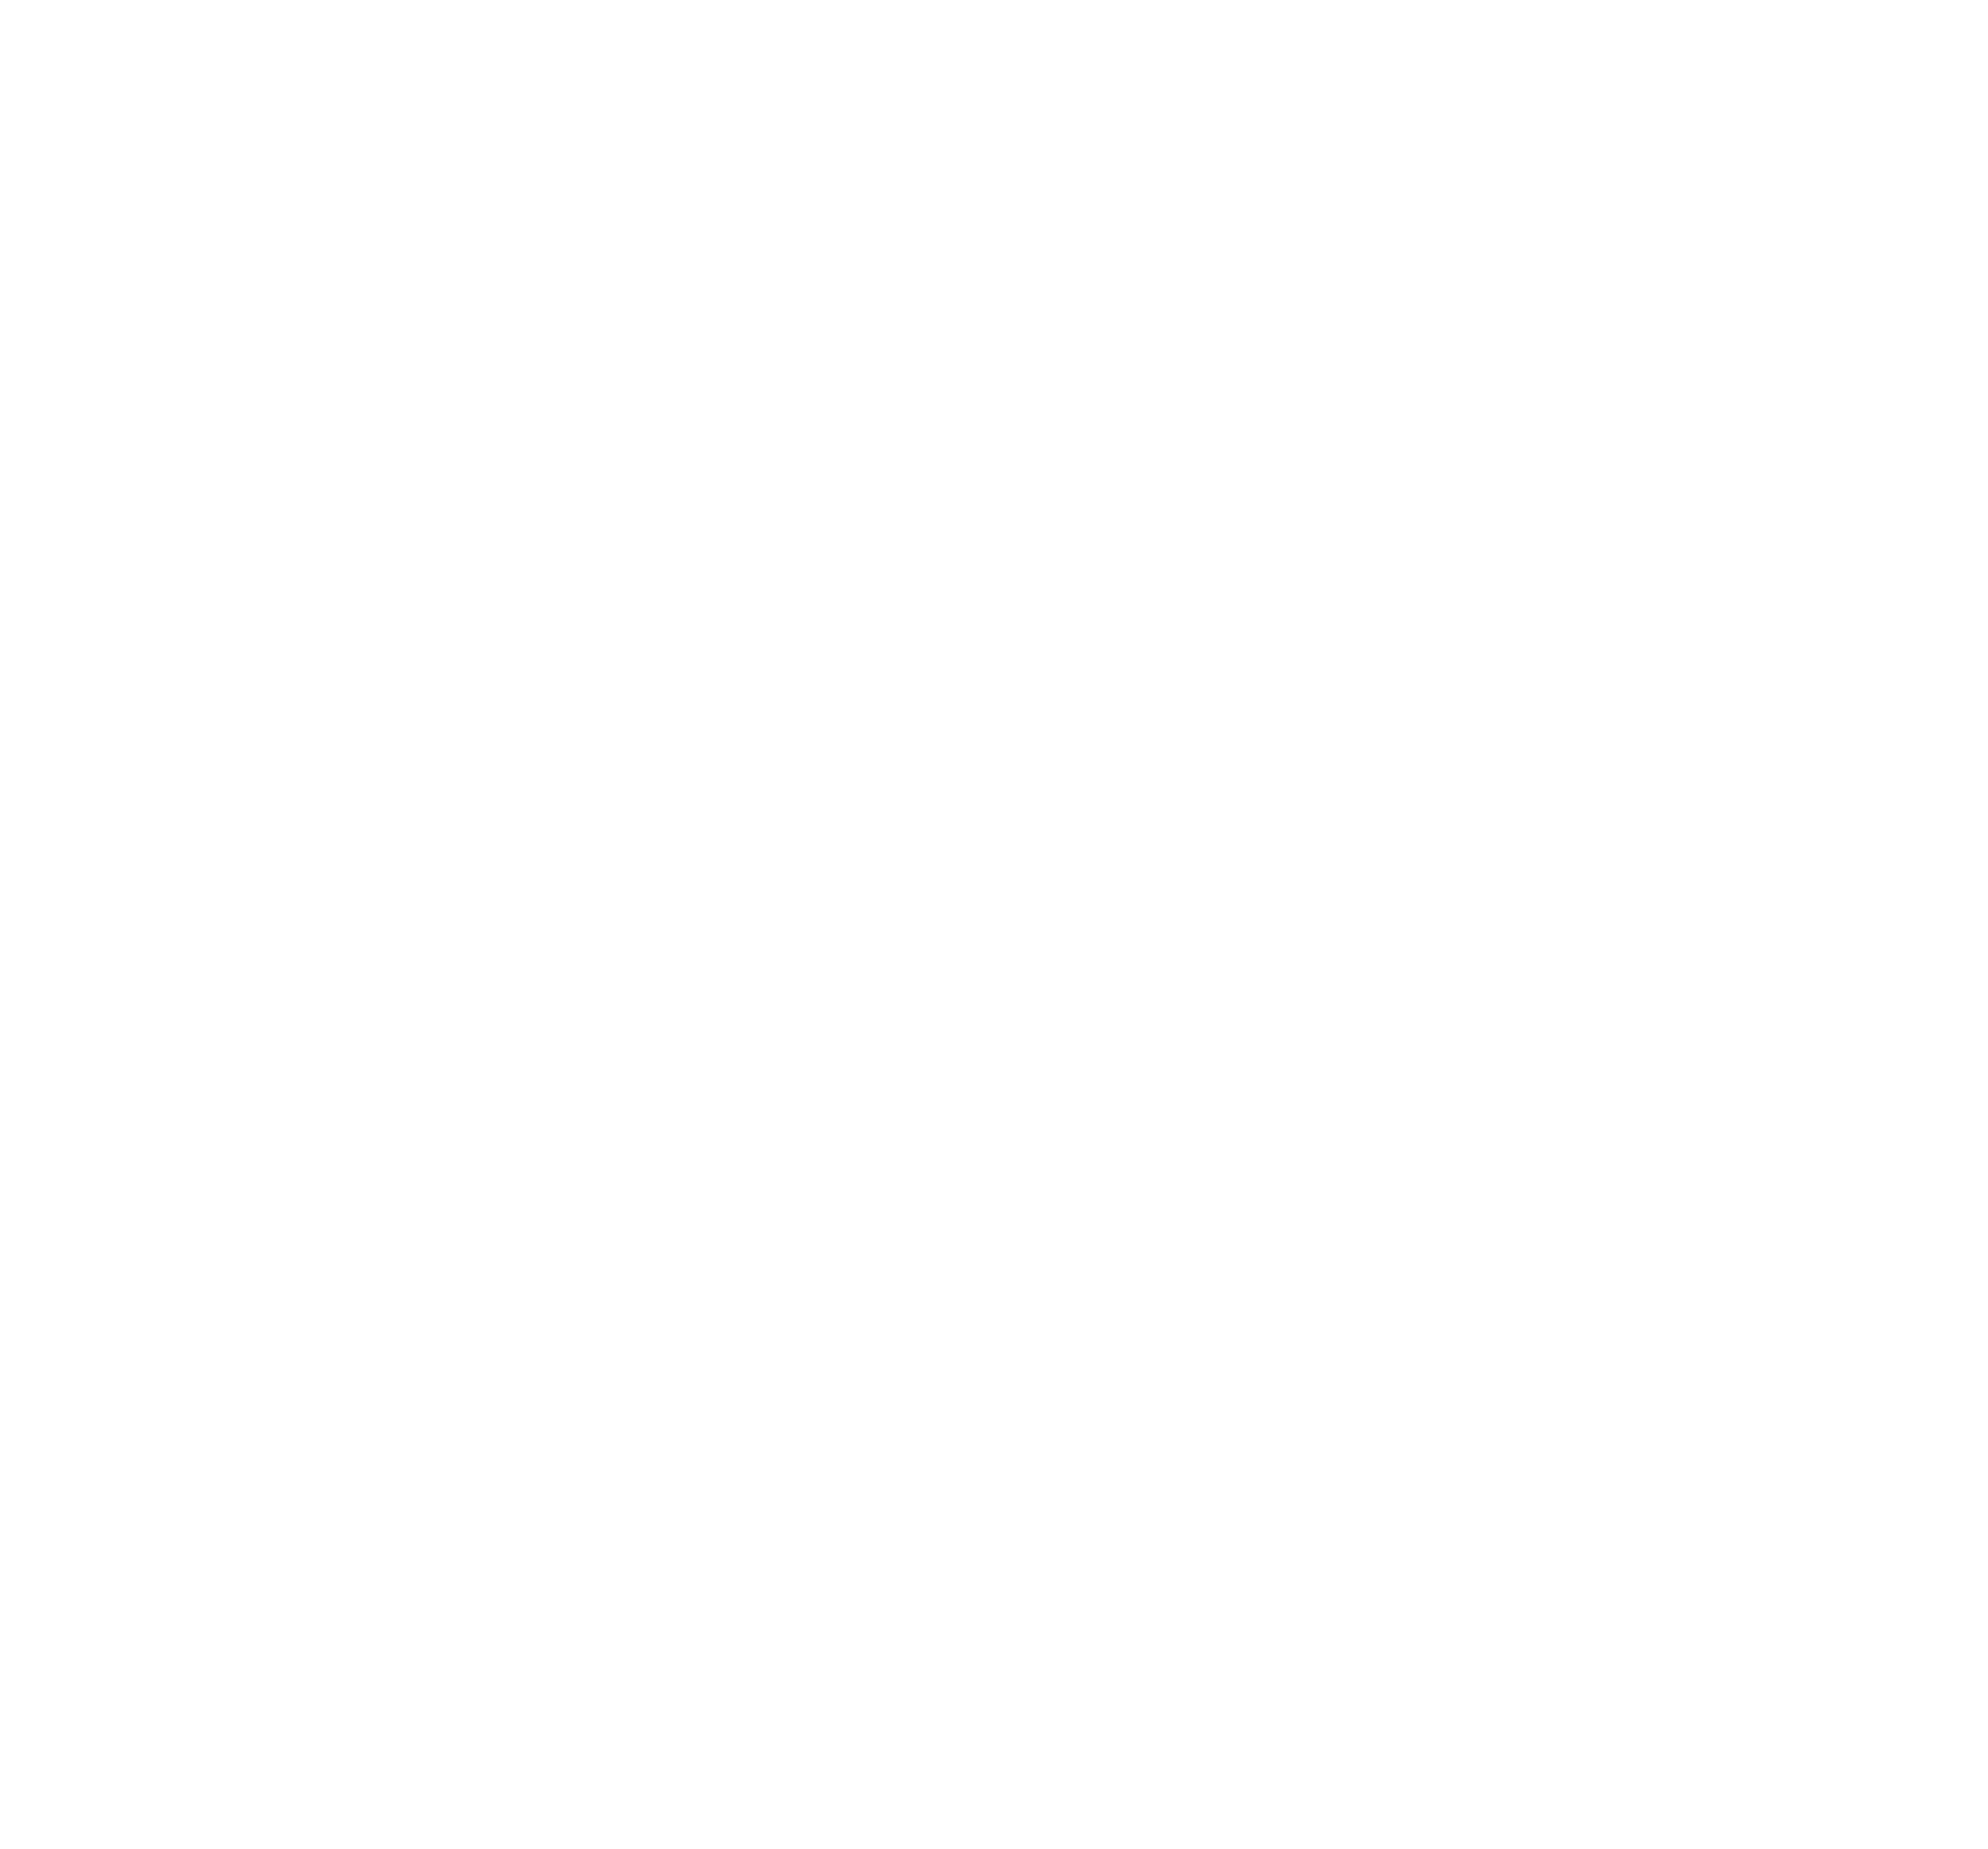 Cummins Png Logo.